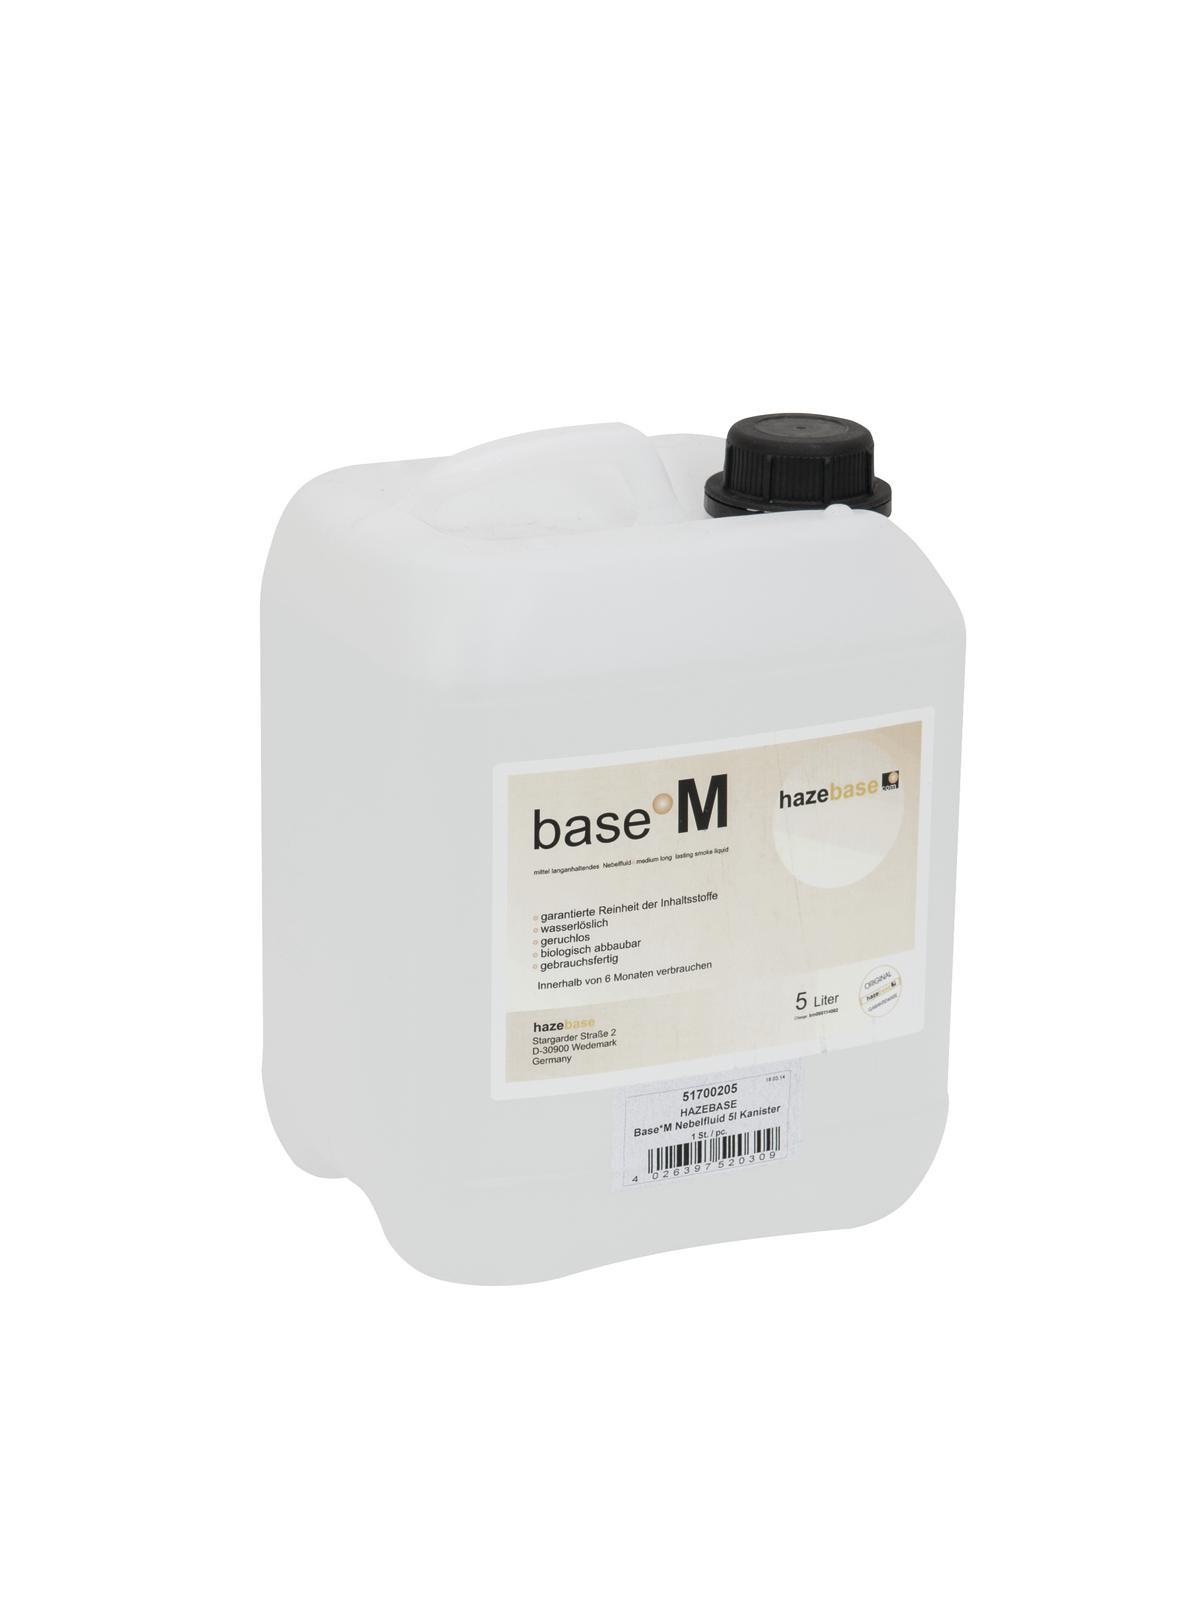 HAZEBASE Base*M Nebelfluid 5l Kanister